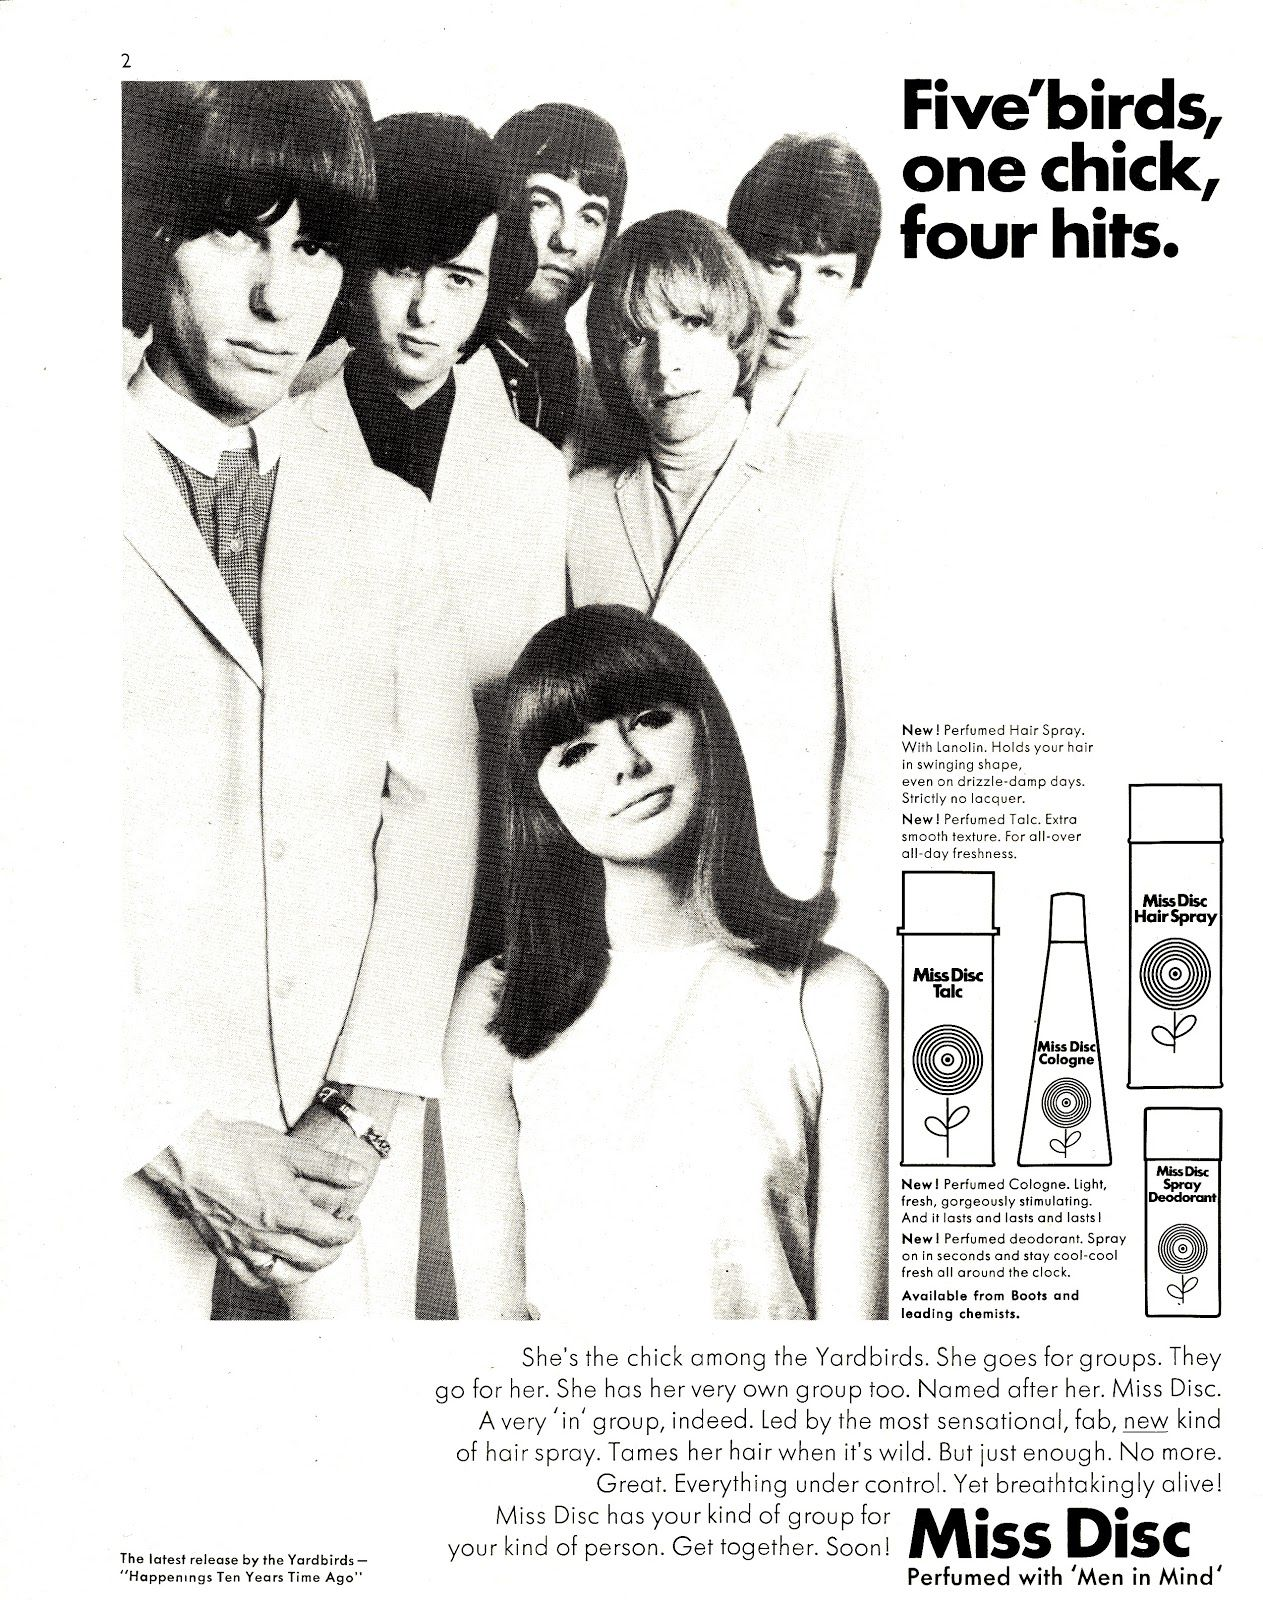 newenglandwoodstock: 1966 — The Yardbirds with model